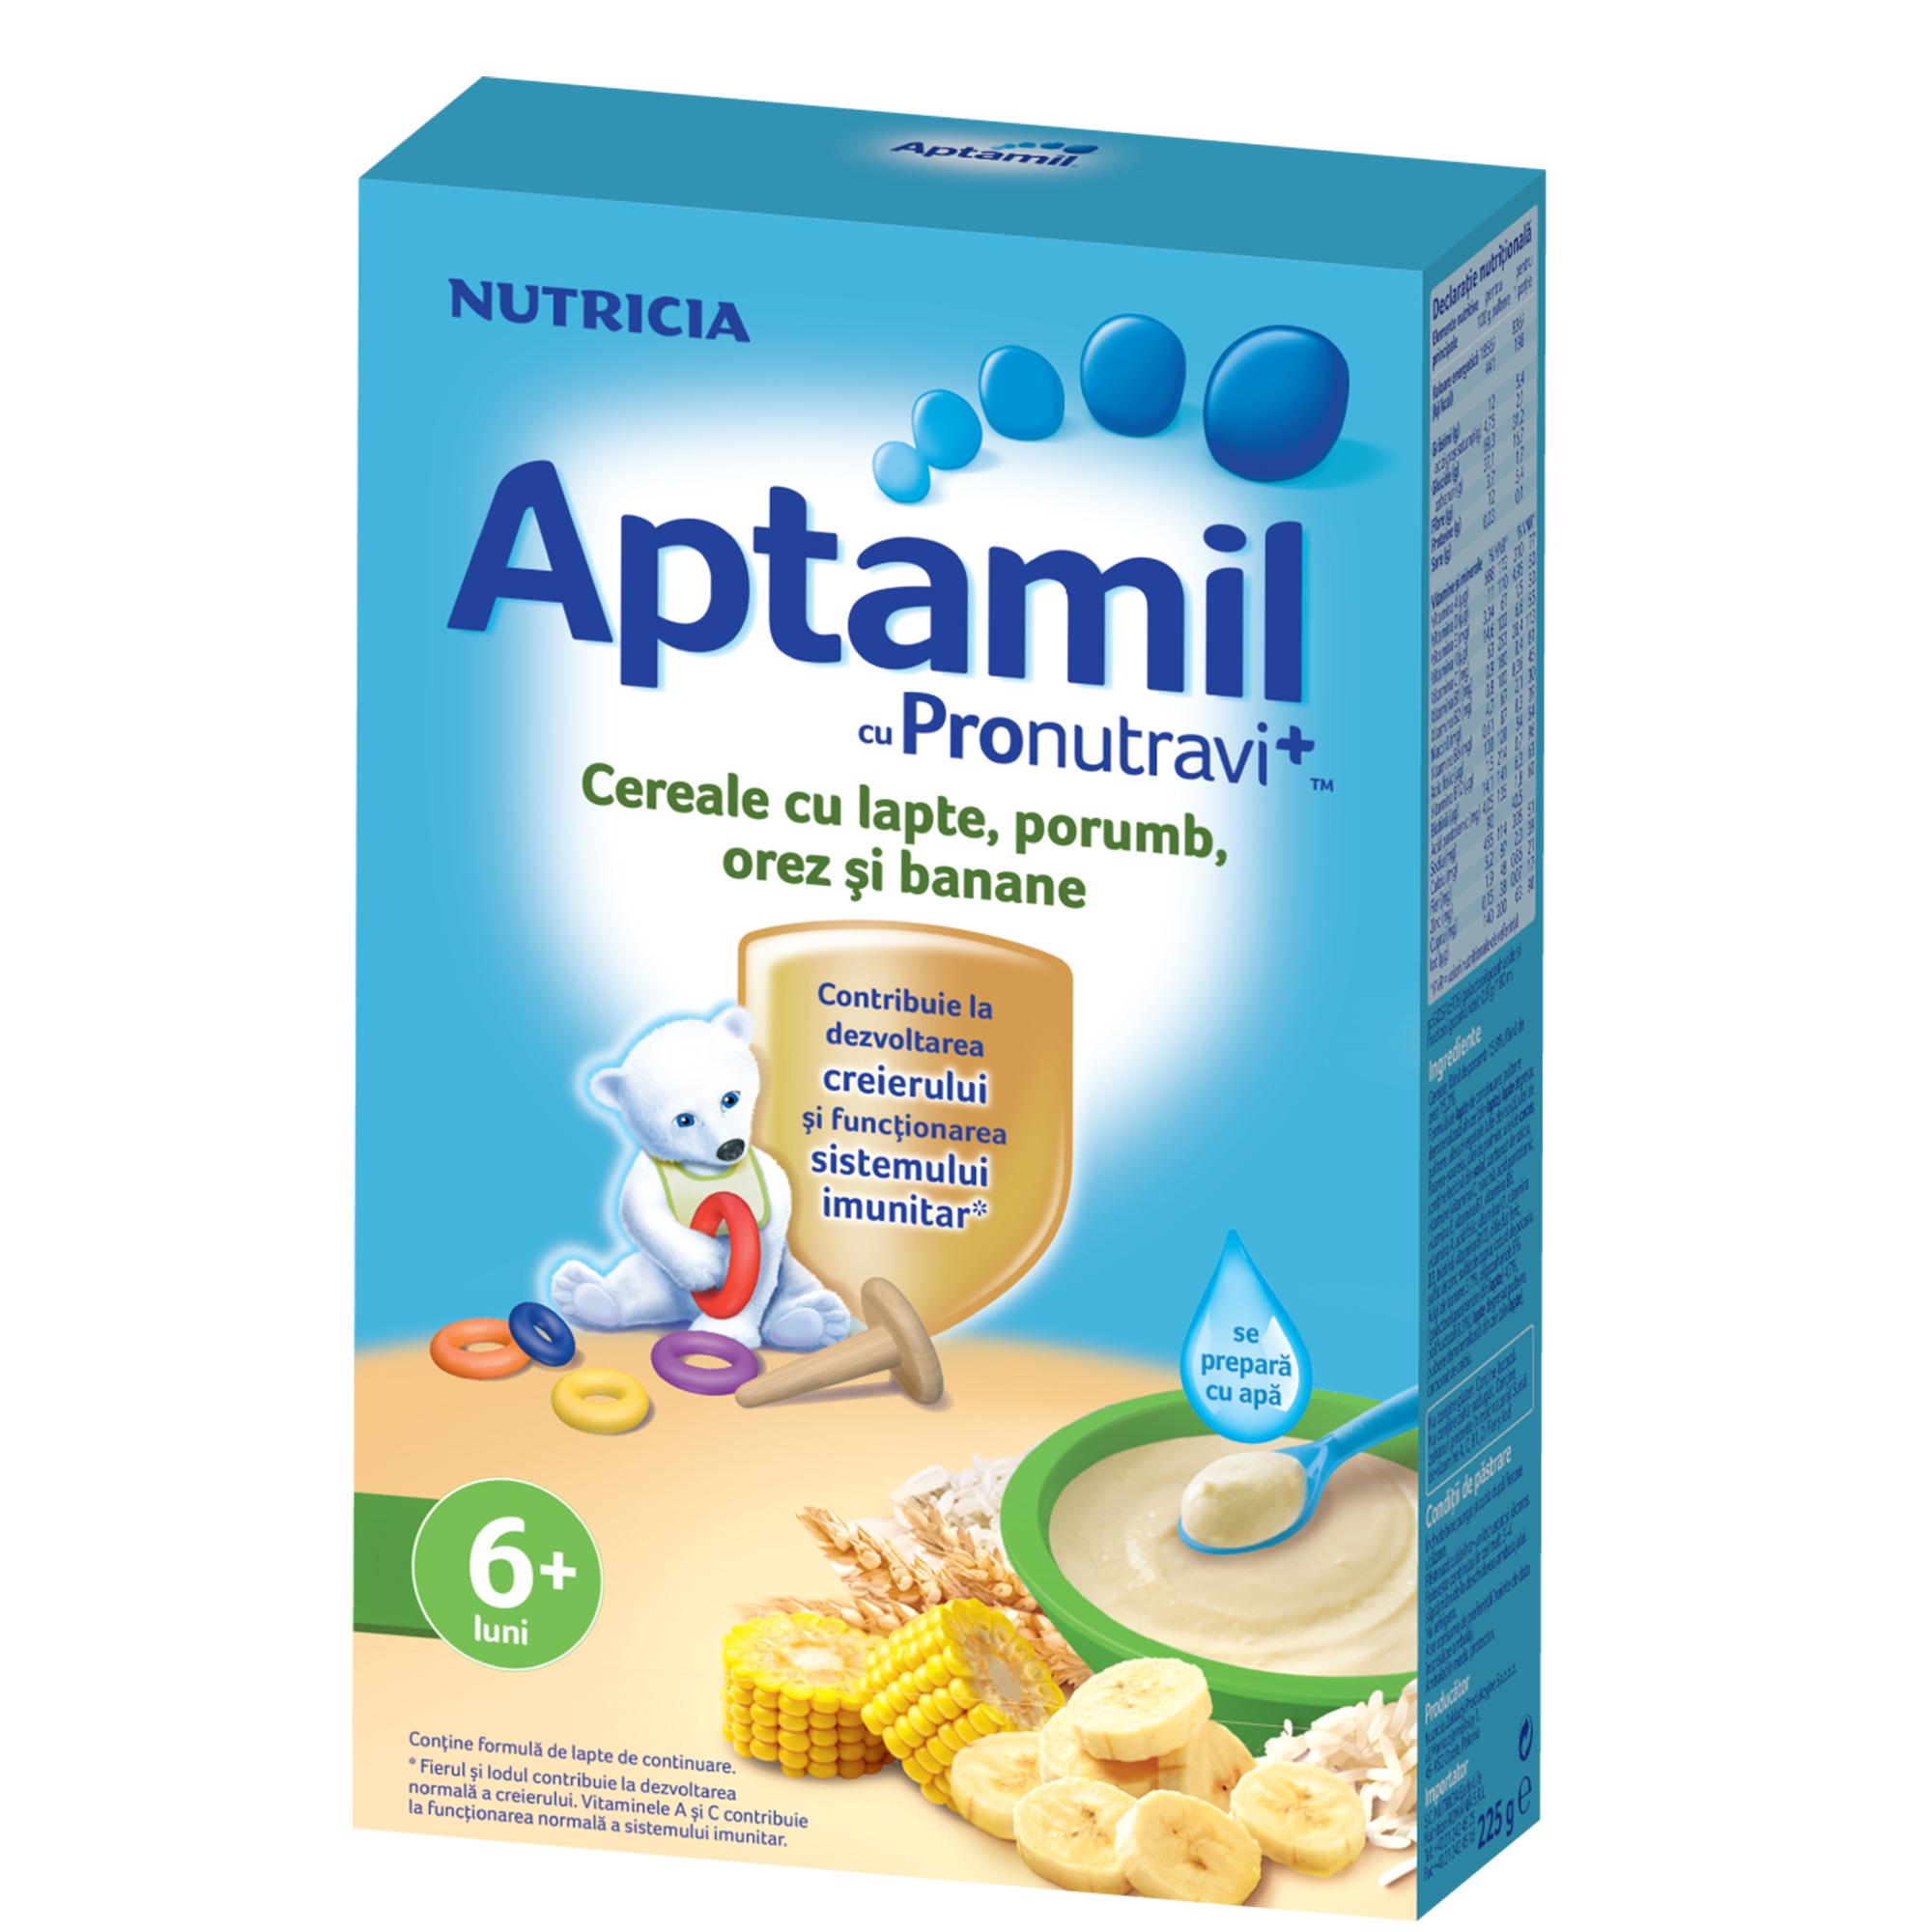 Cereale cu lapte Nutricia, Aptamil Porumb, orez si banane, 225g, 6luni+